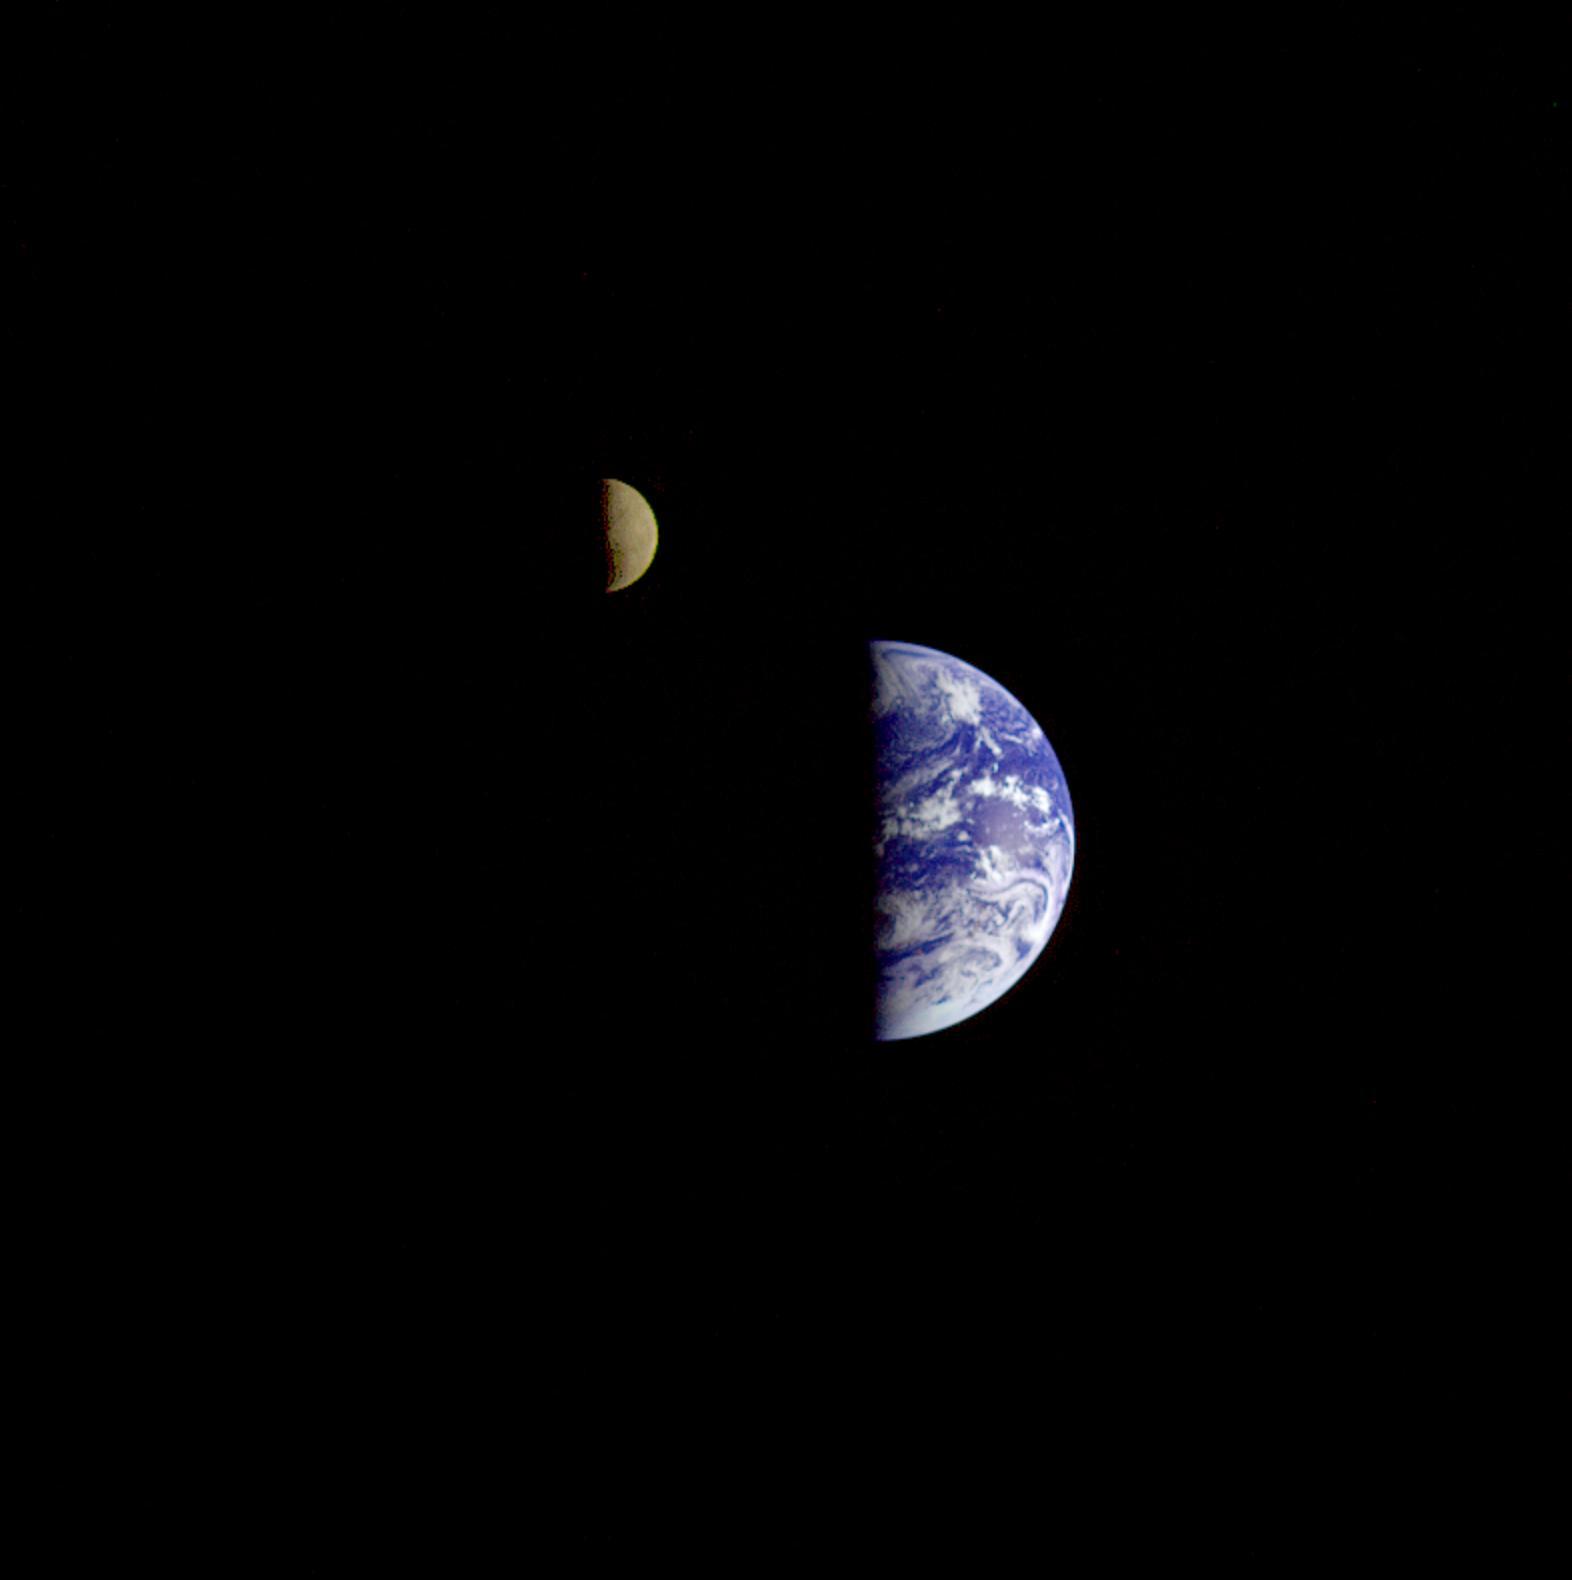 galileo moon nasa - photo #18